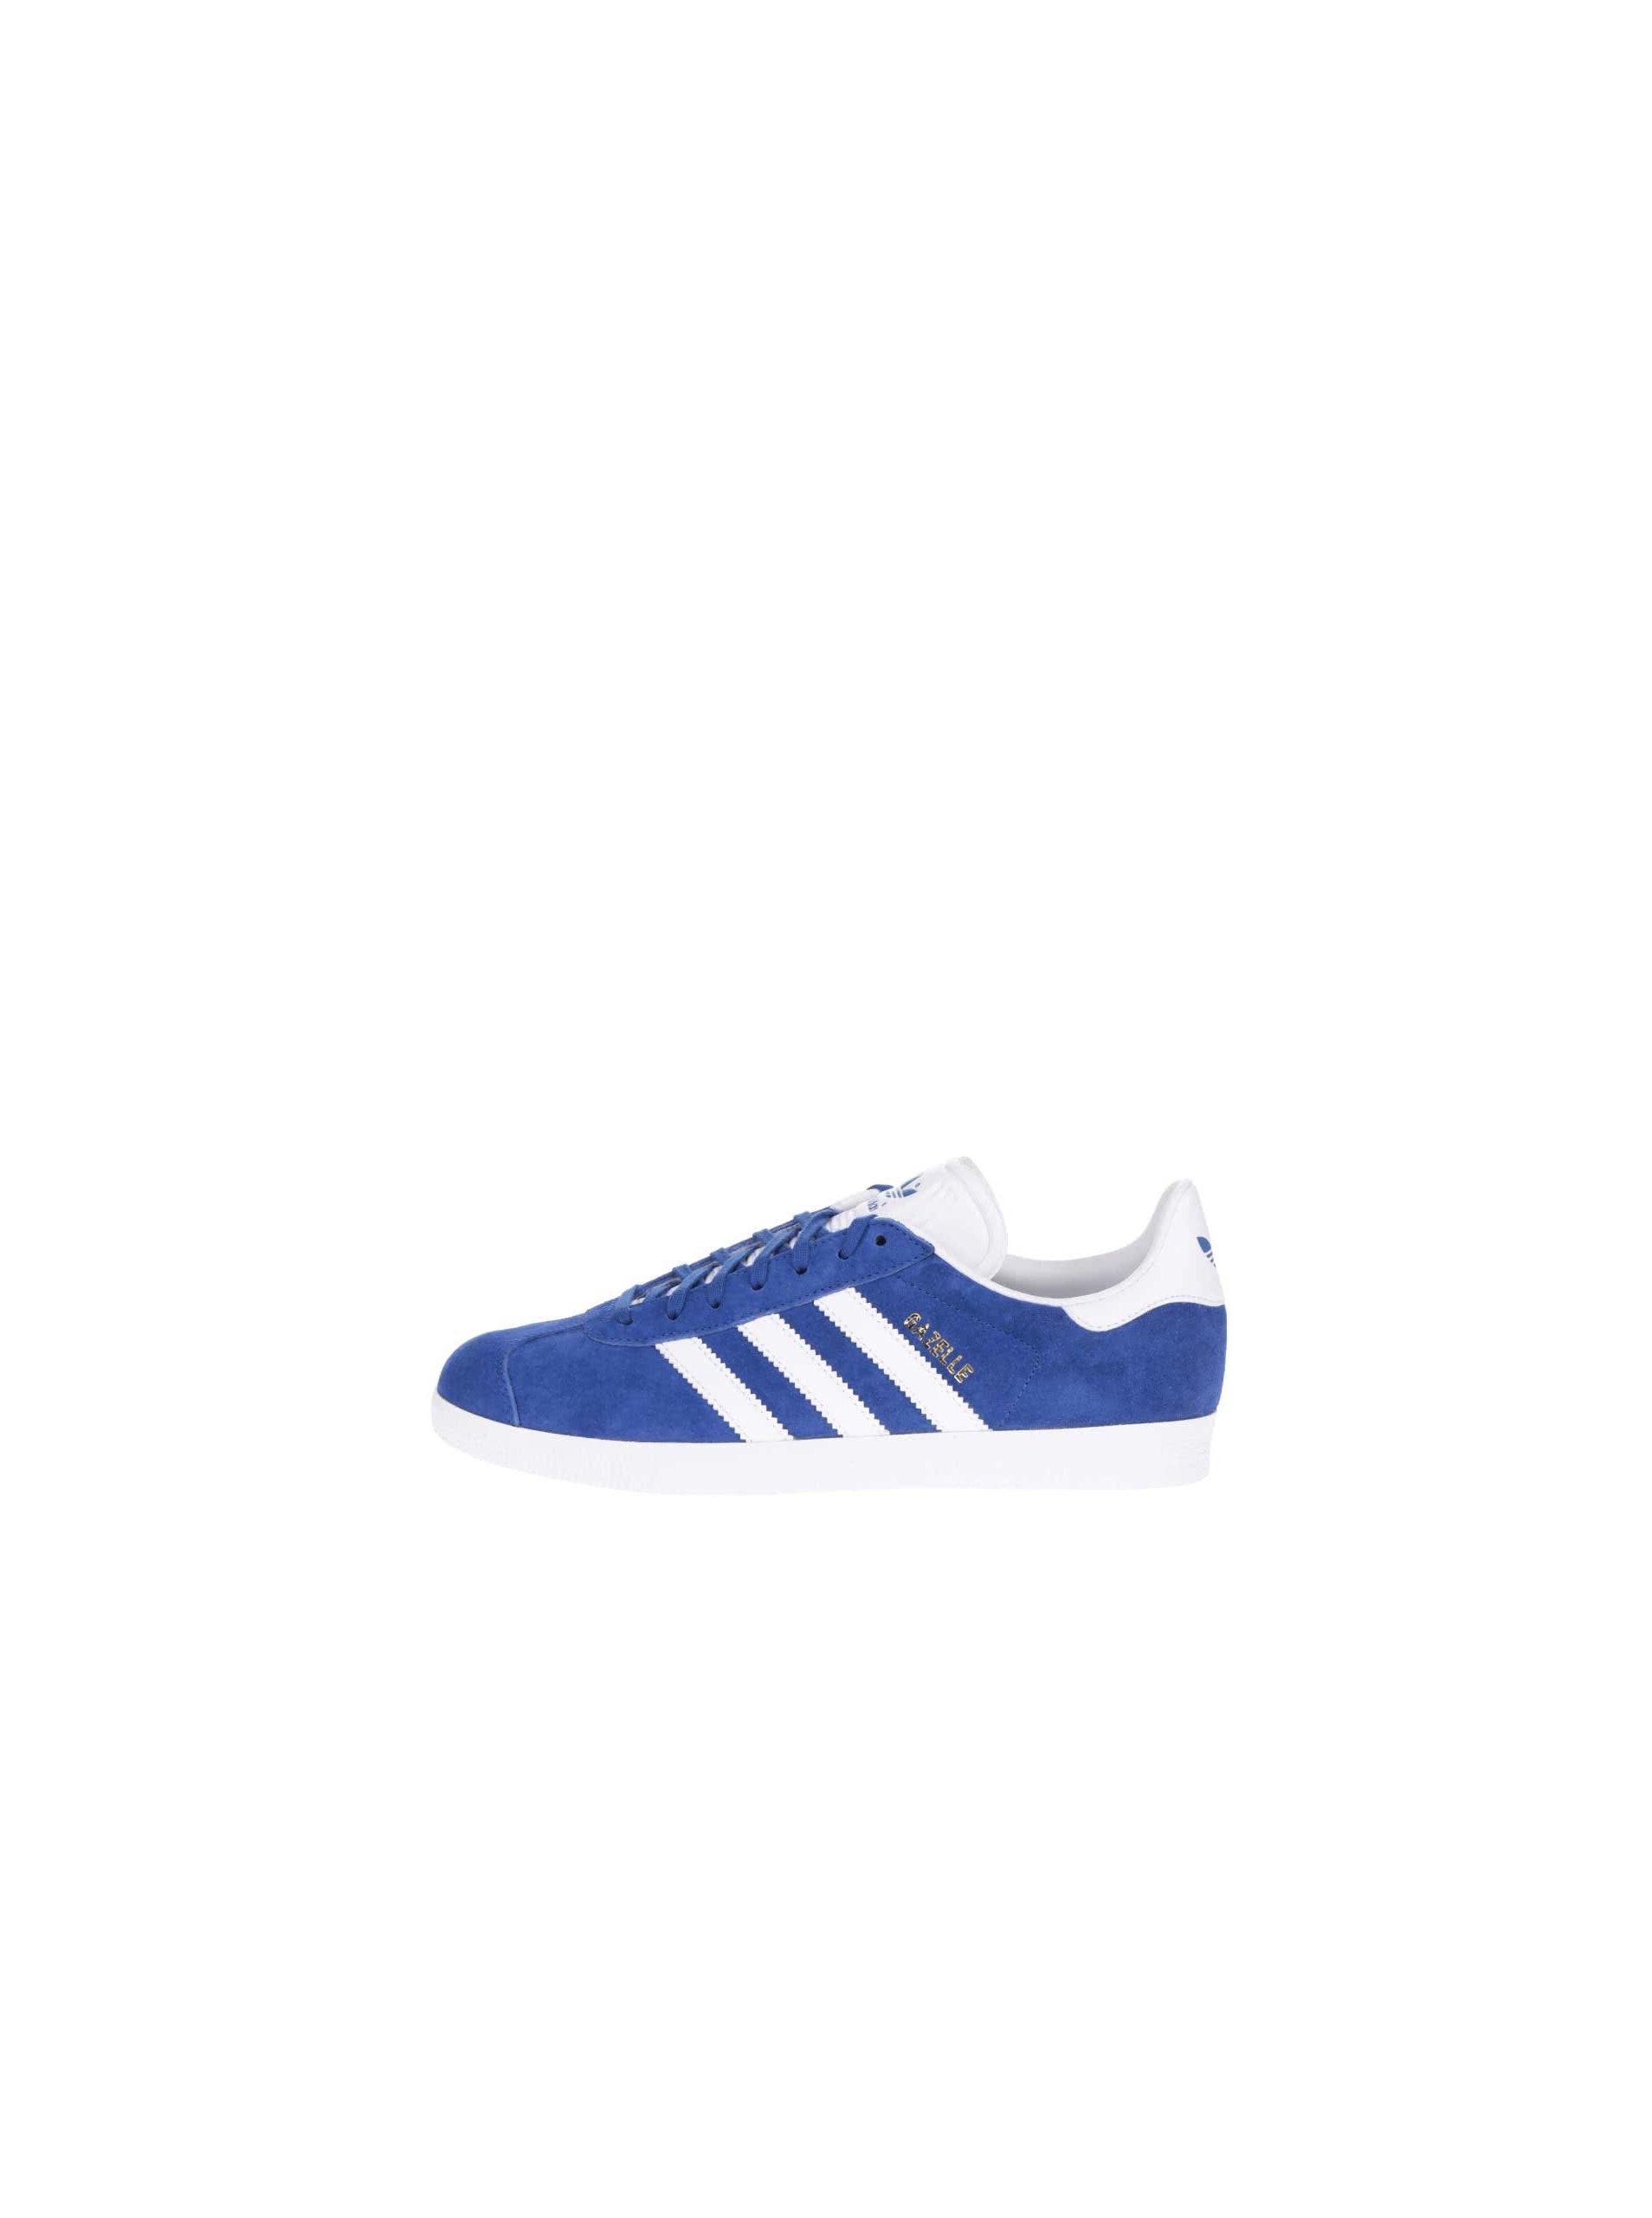 f7632bff158f8 Modré pánske semišové tenisky adidas Originals Gazelle